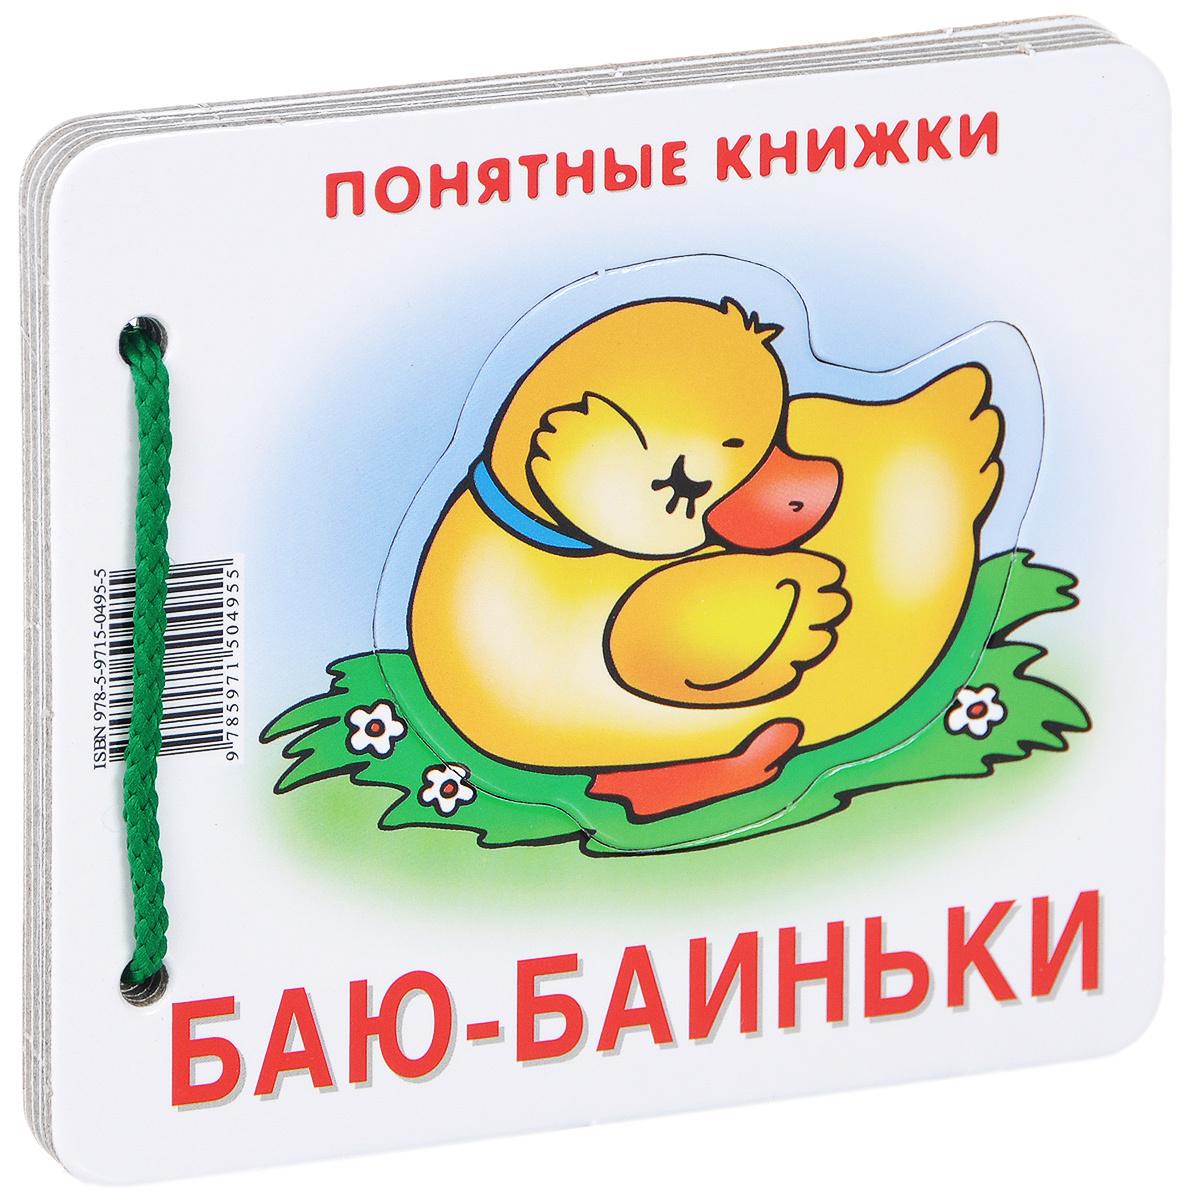 Баю-баиньки | Чекмарева Ирина Яковлевна, Савушкин Сергей Николаевич  #1